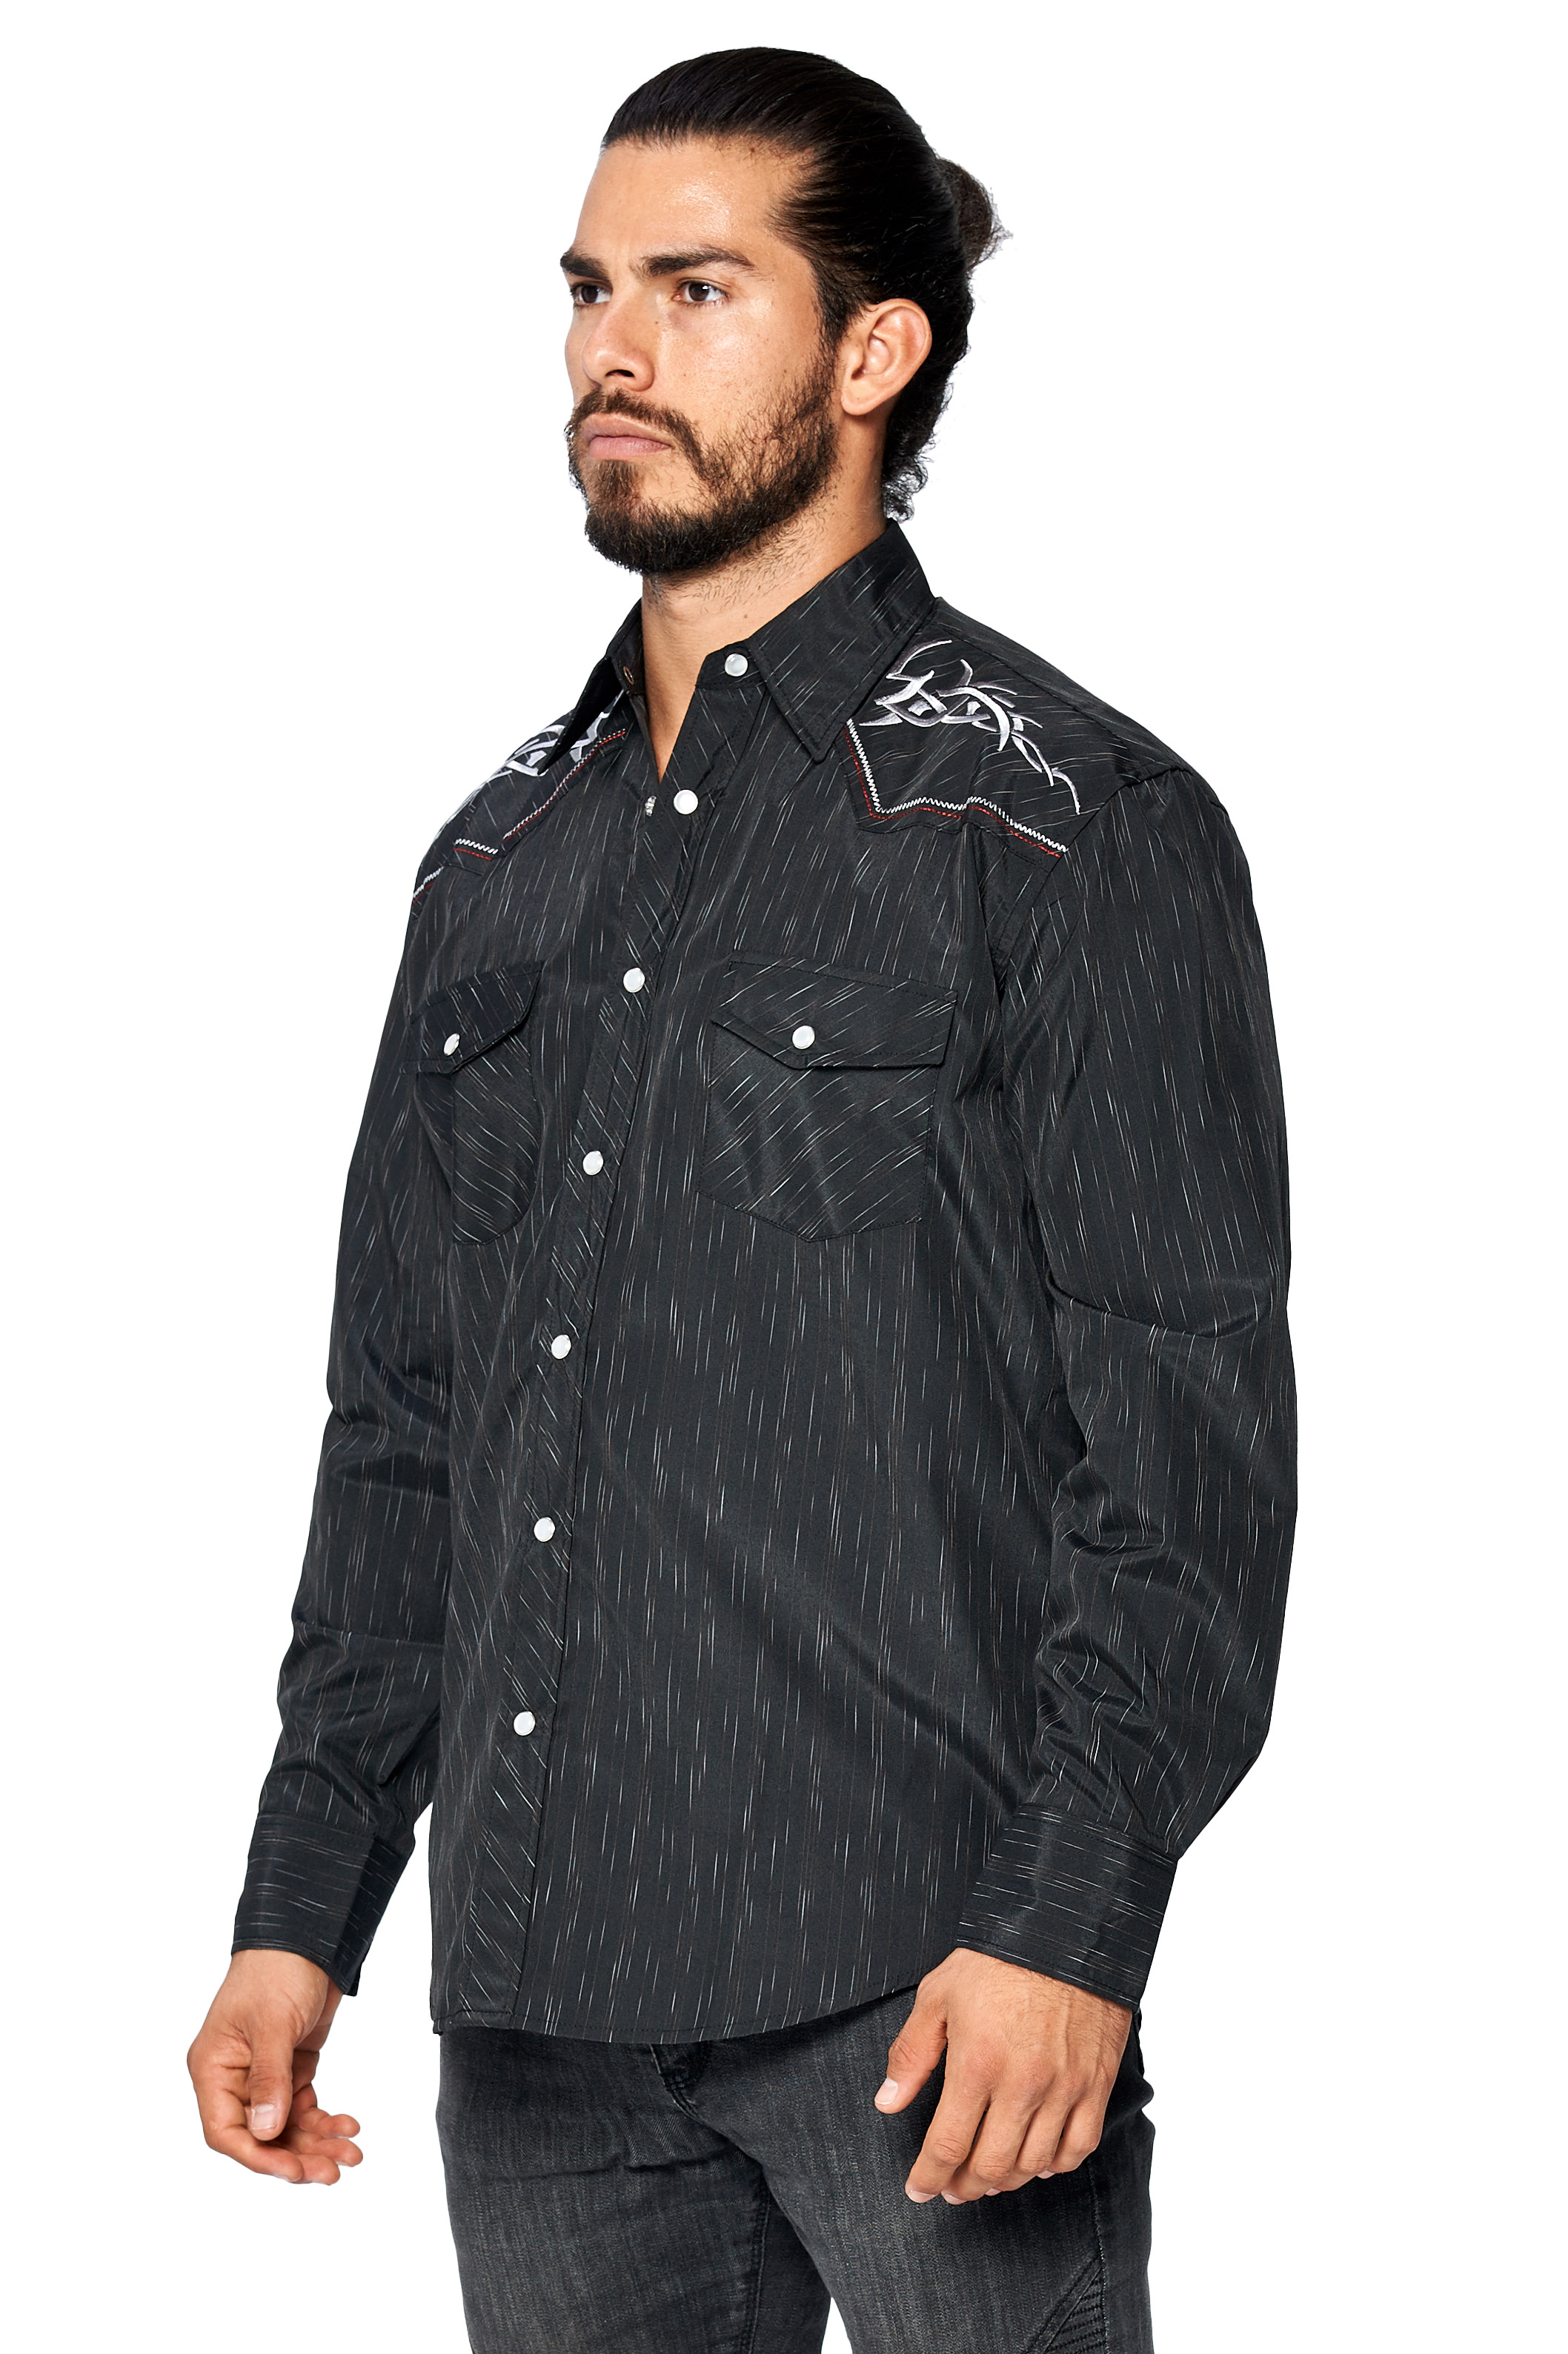 LW-Men-039-s-Pearl-Snap-Tribal-Stylish-Printed-Woven-Western-Vaquero-Rodeo-Shirt thumbnail 77